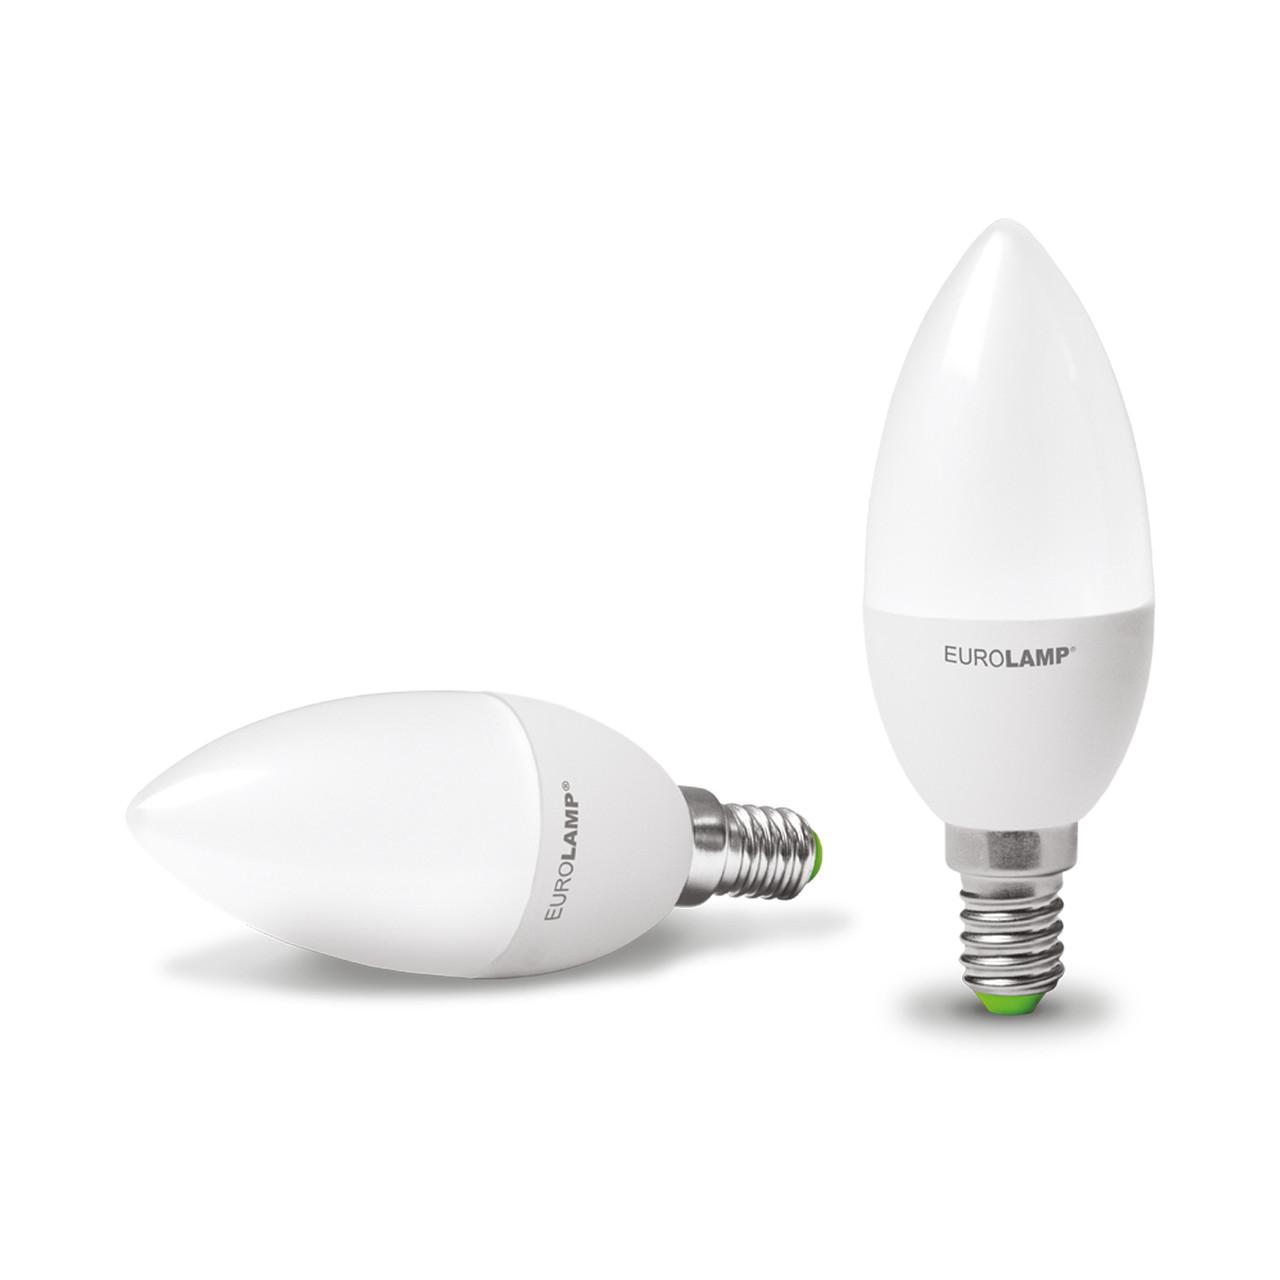 EUROLAMP LED Лампа ЕКО Свеча 6W E14 3000K